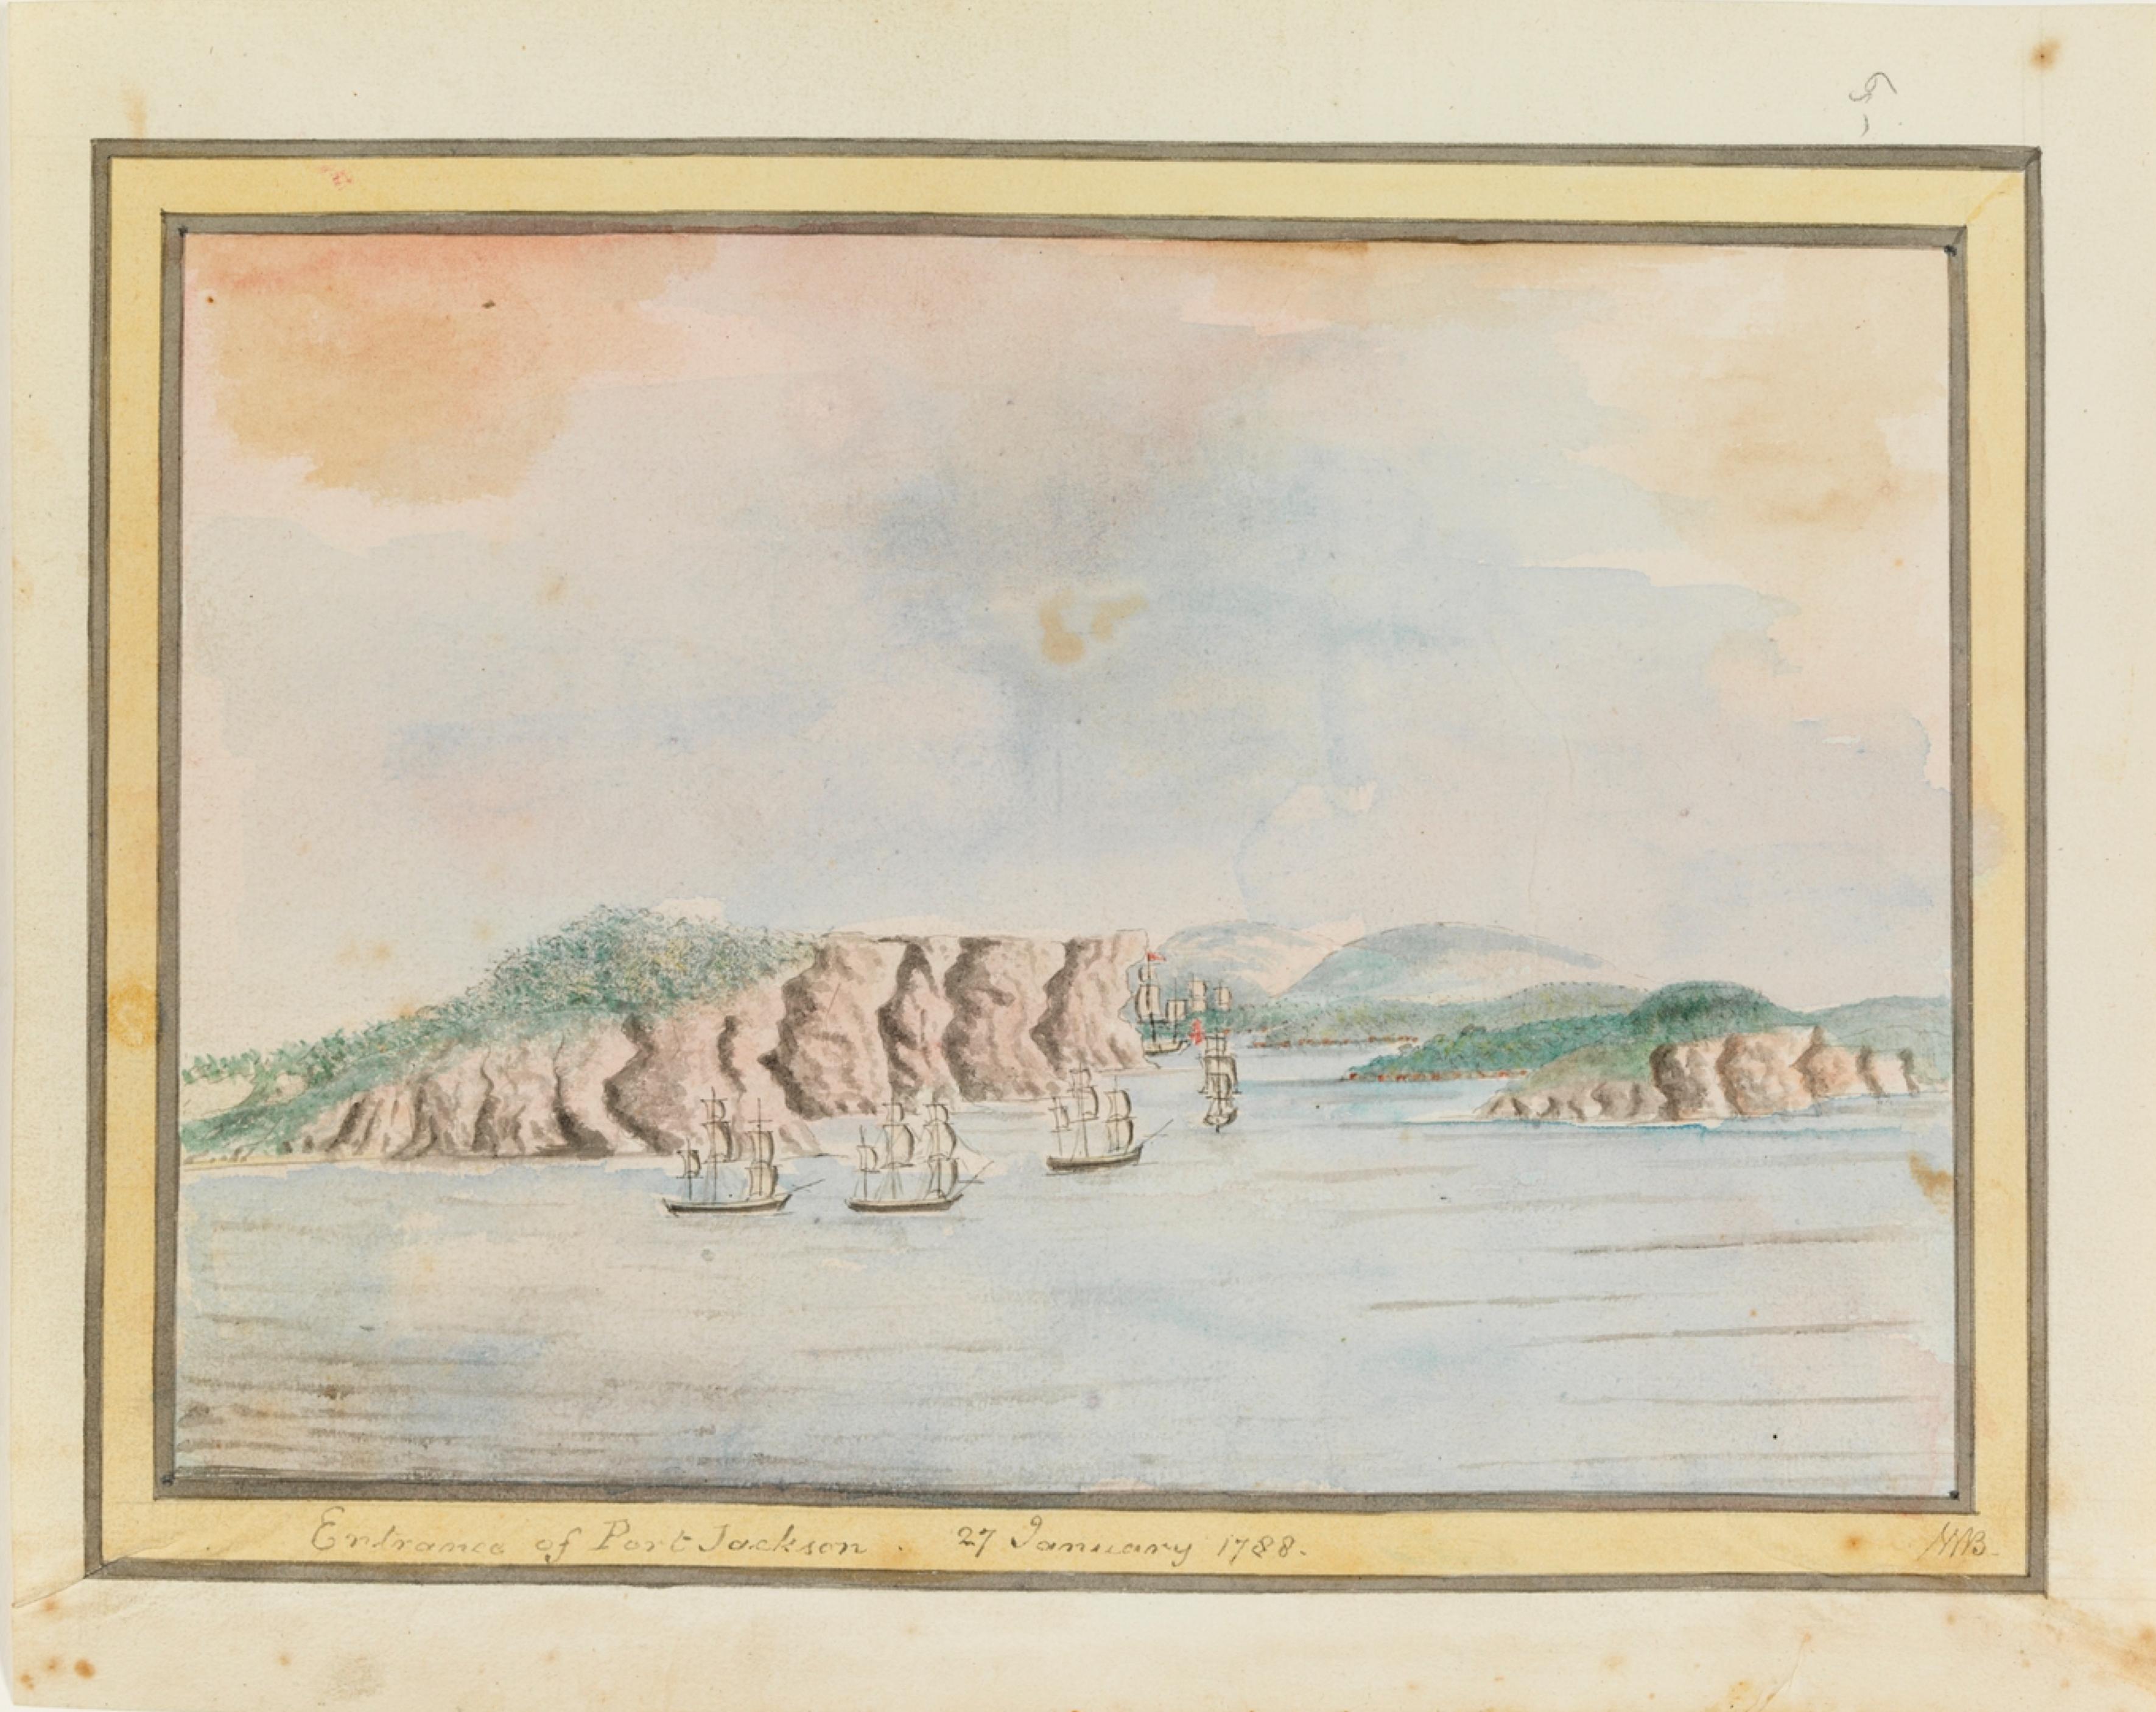 Entrance of Port Jackson, 27 January 1788